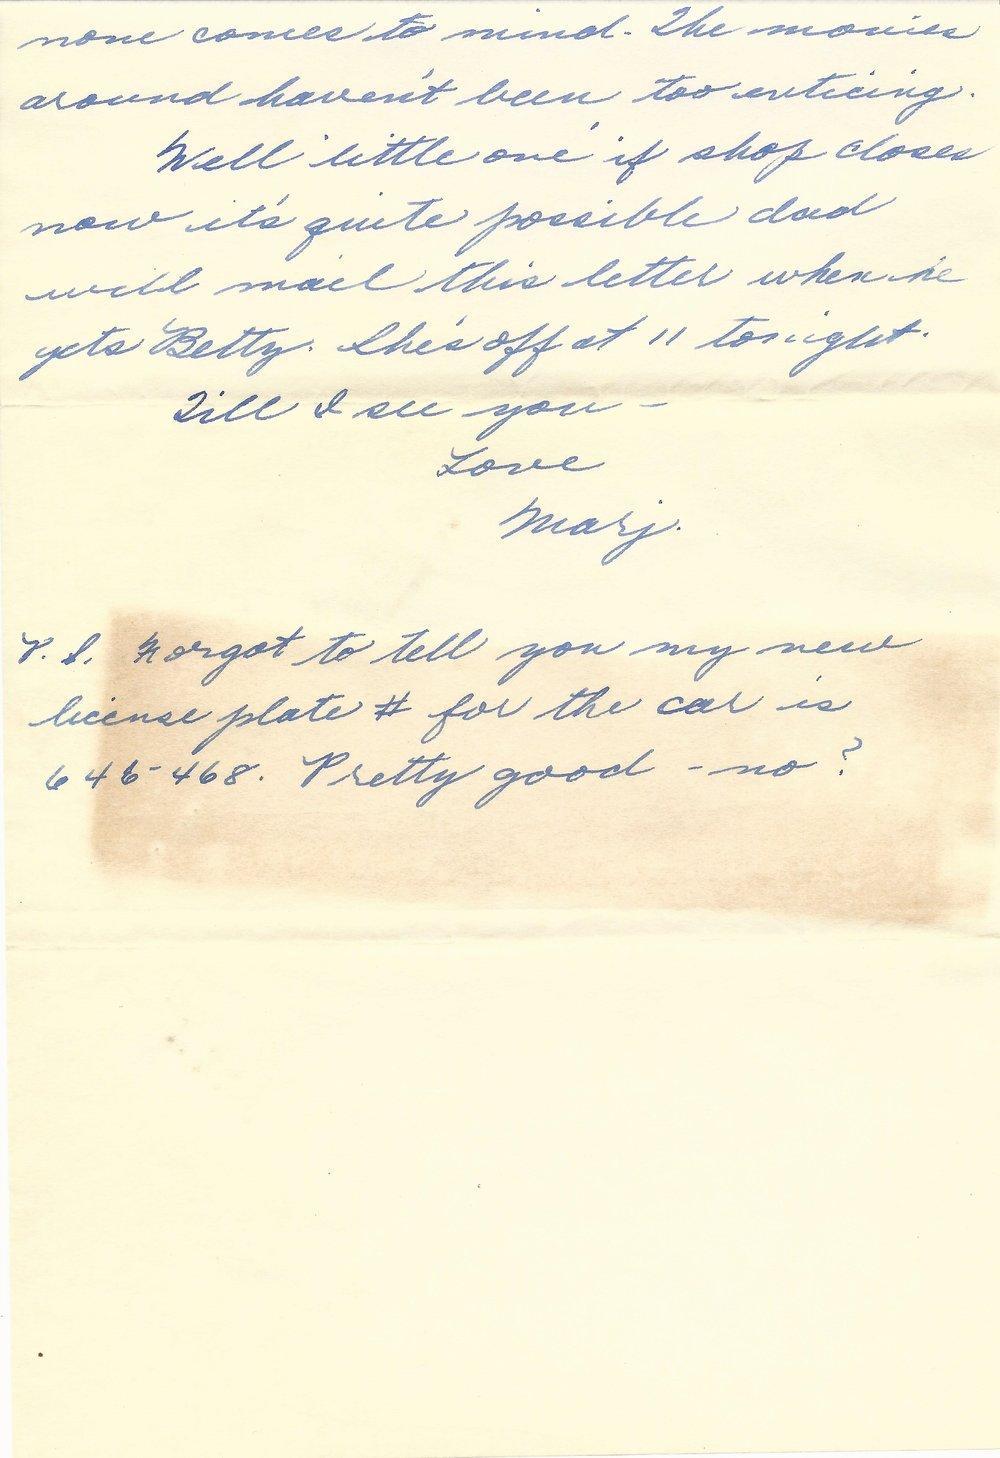 8. Jan. 16, 1953 (Oma)_Page_6.jpg